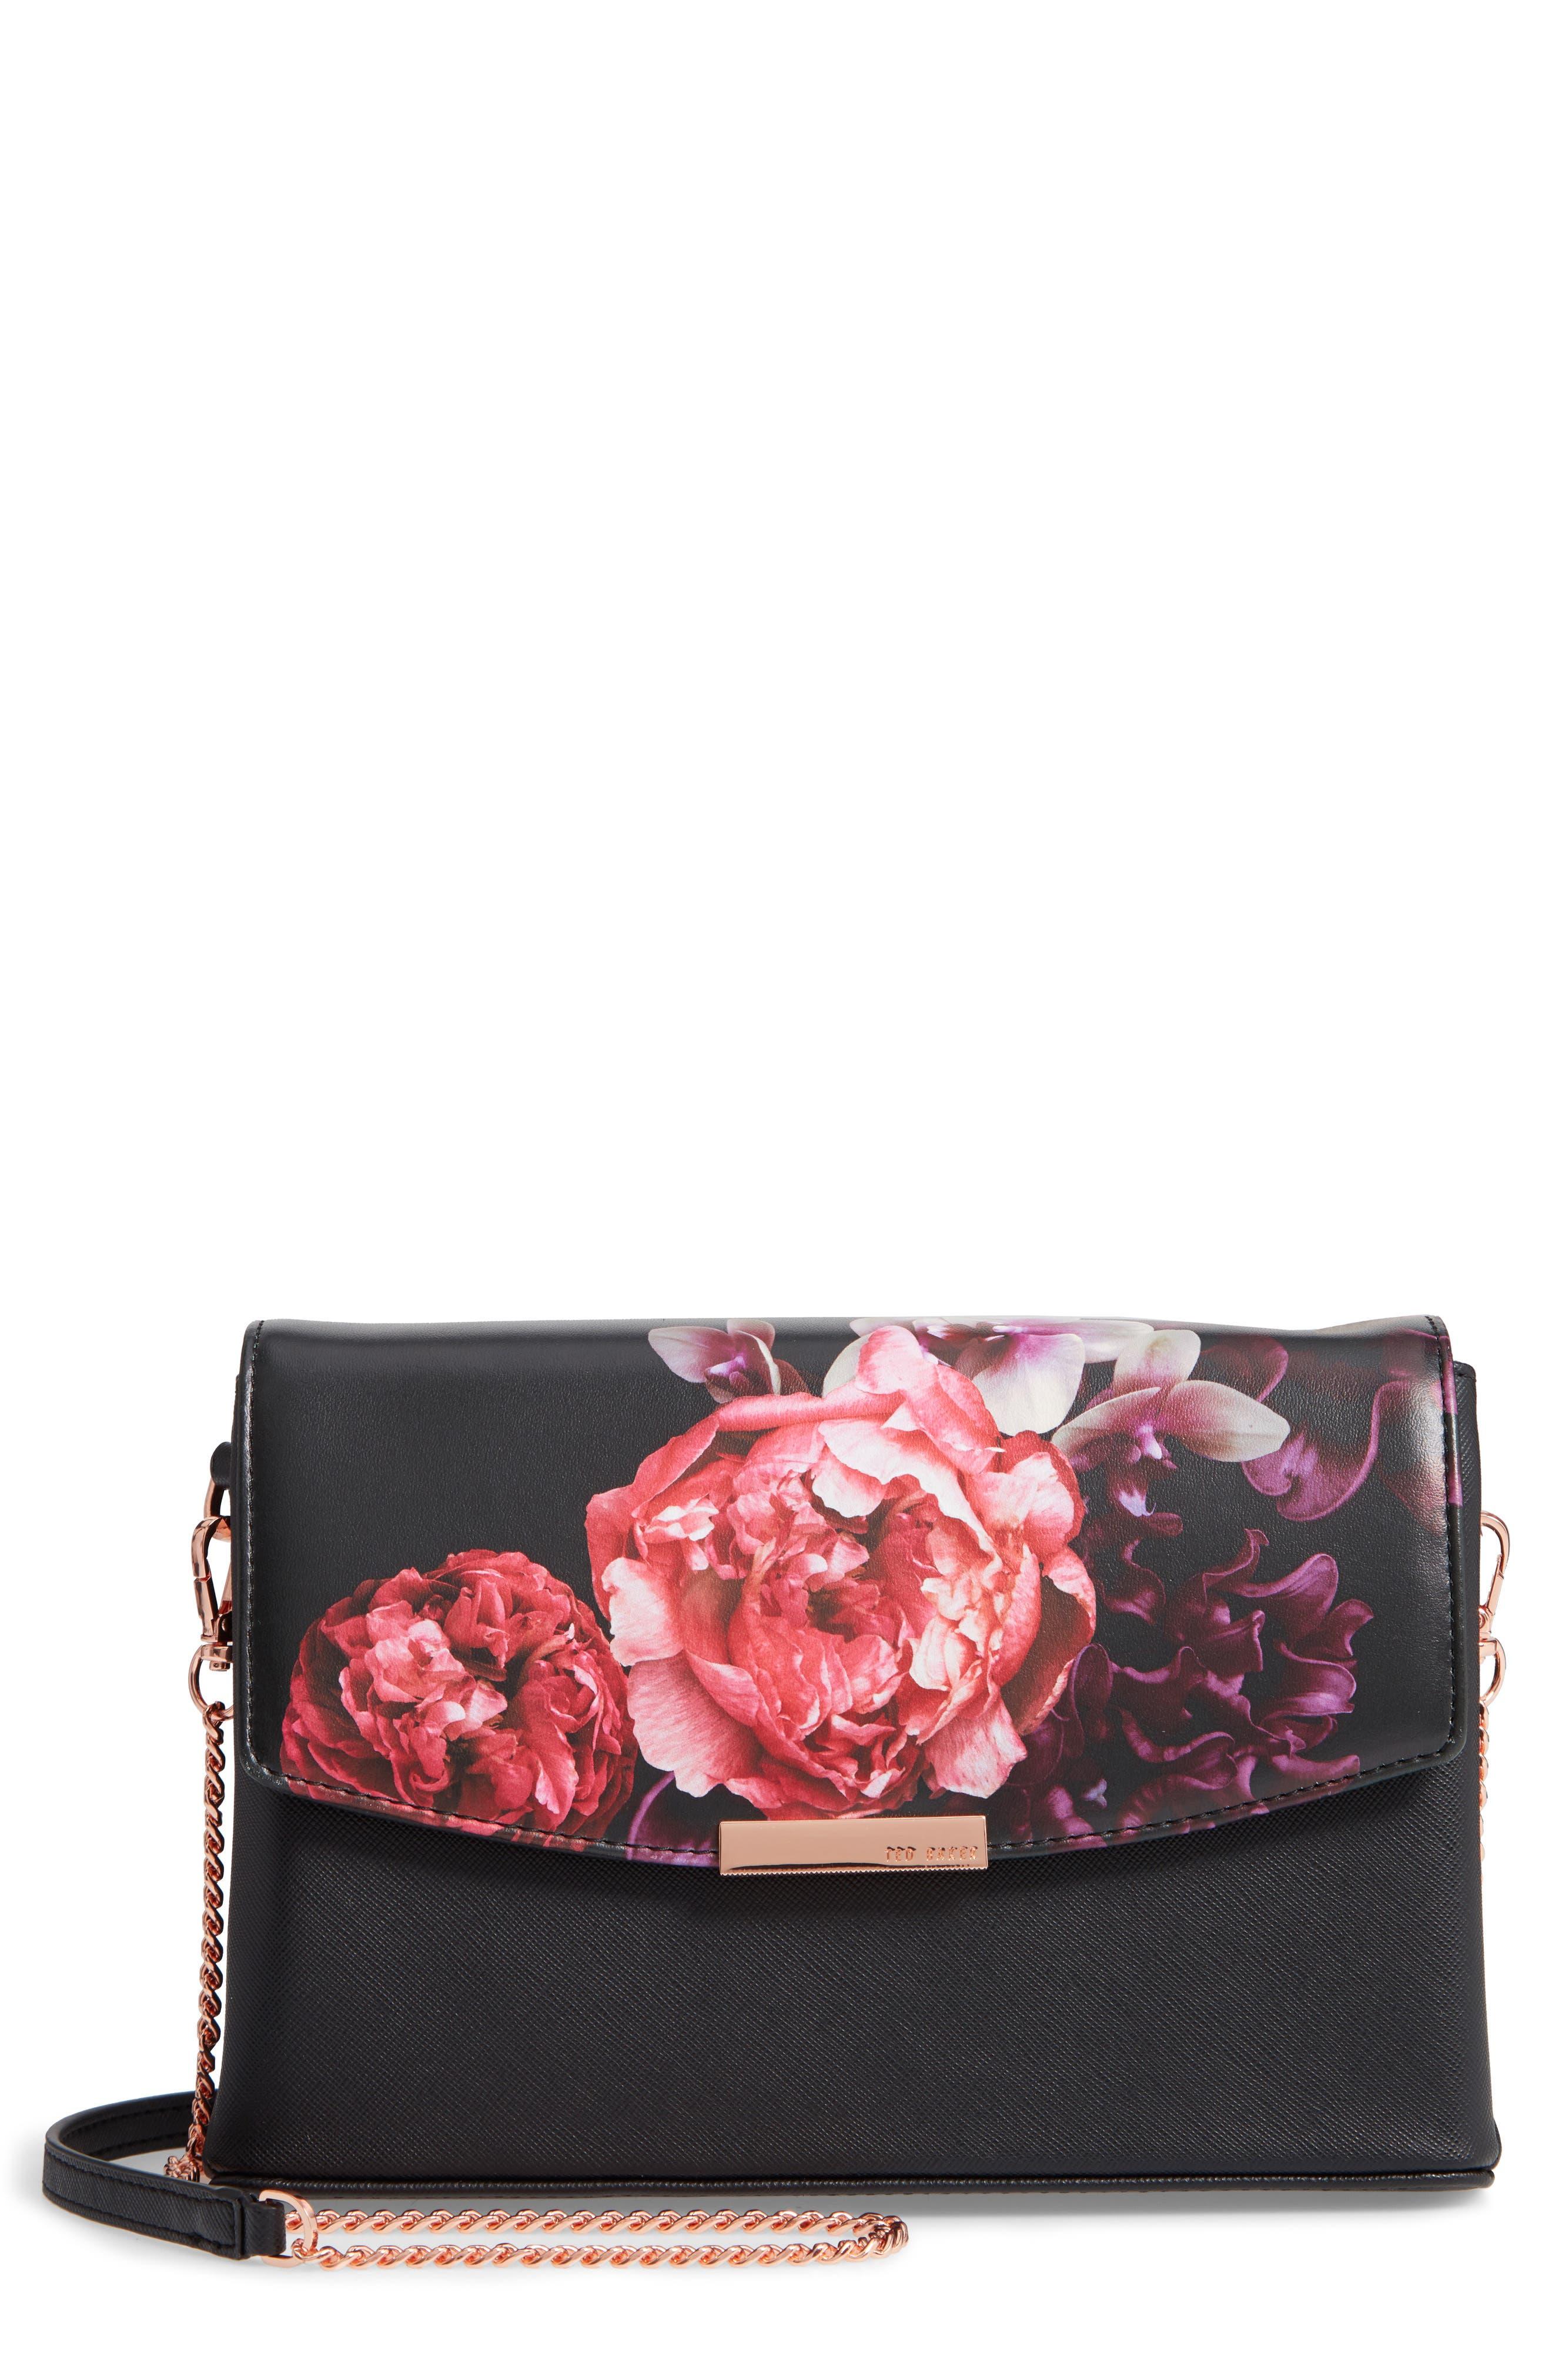 Viickky Splendour Print Faux Leather Crossbody Bag,                         Main,                         color, BLACK